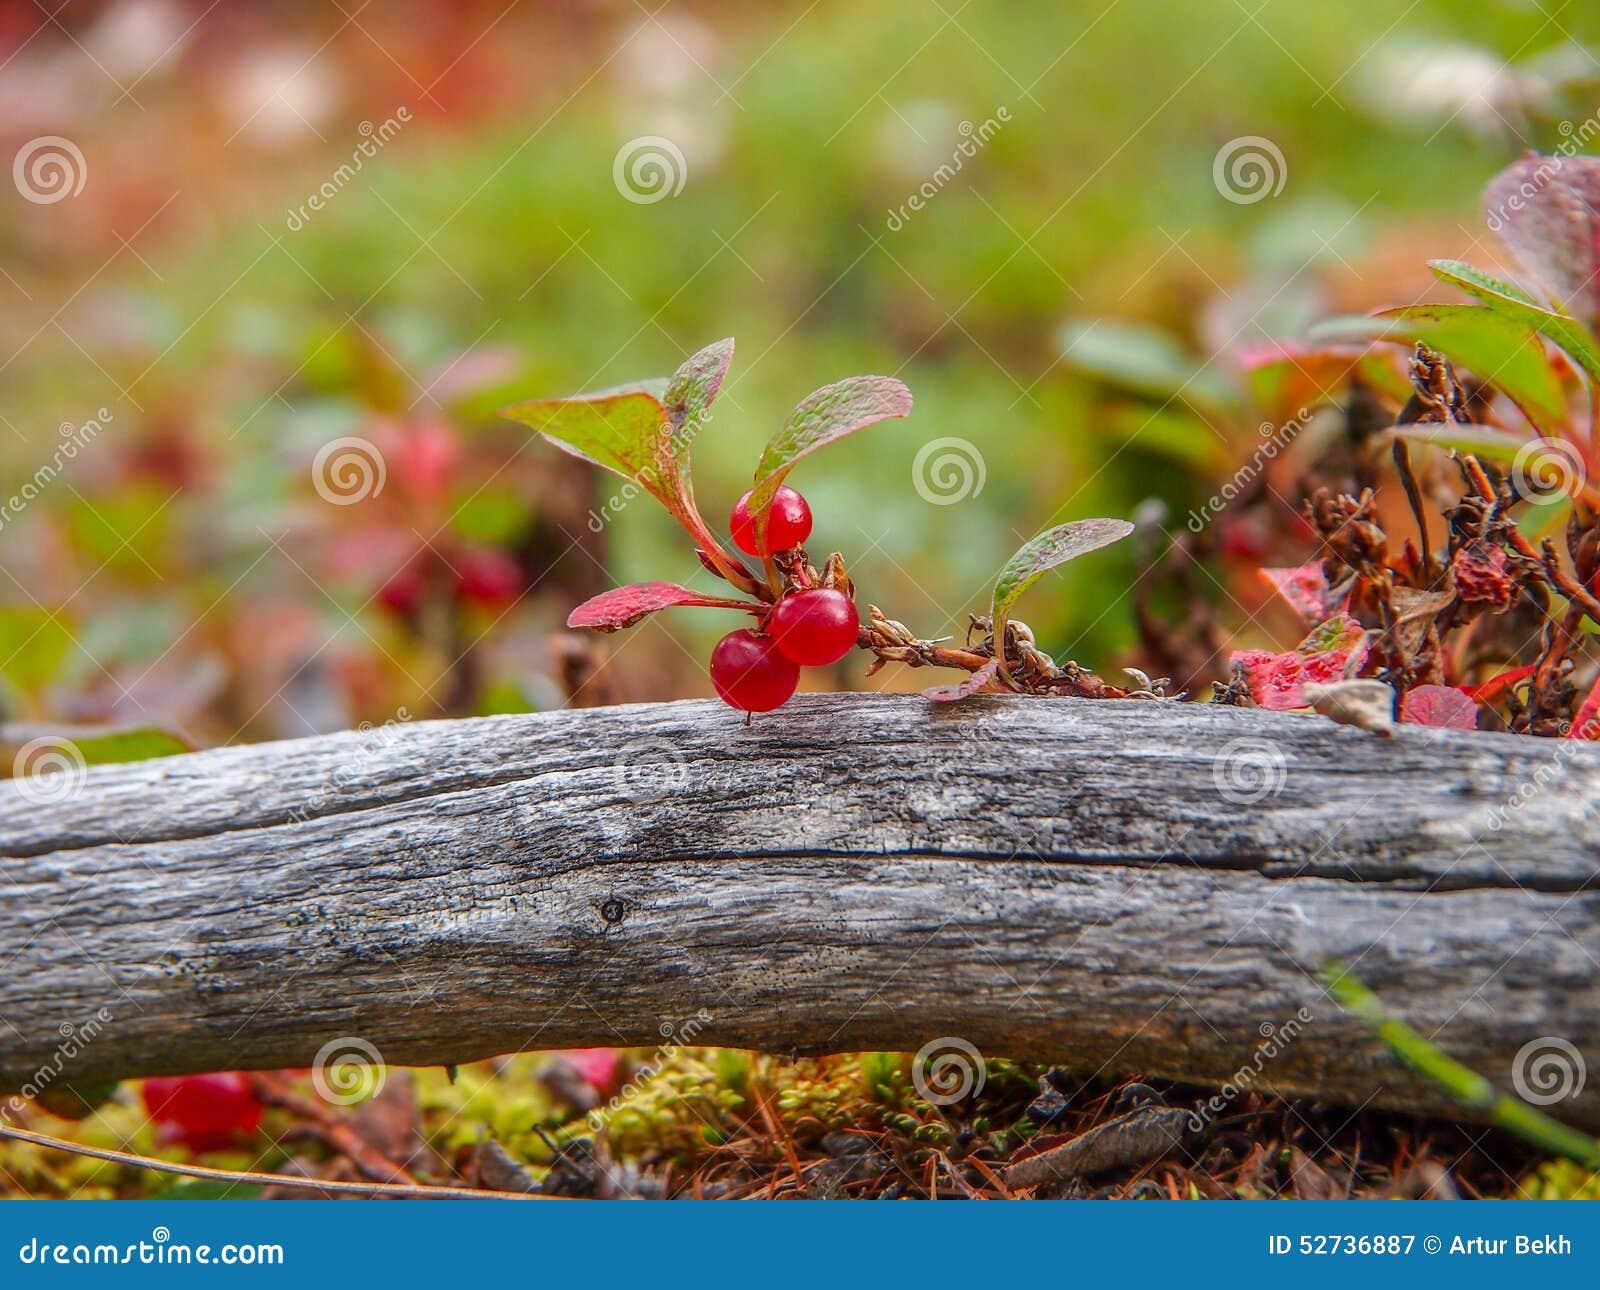 Fresa endémica y rara